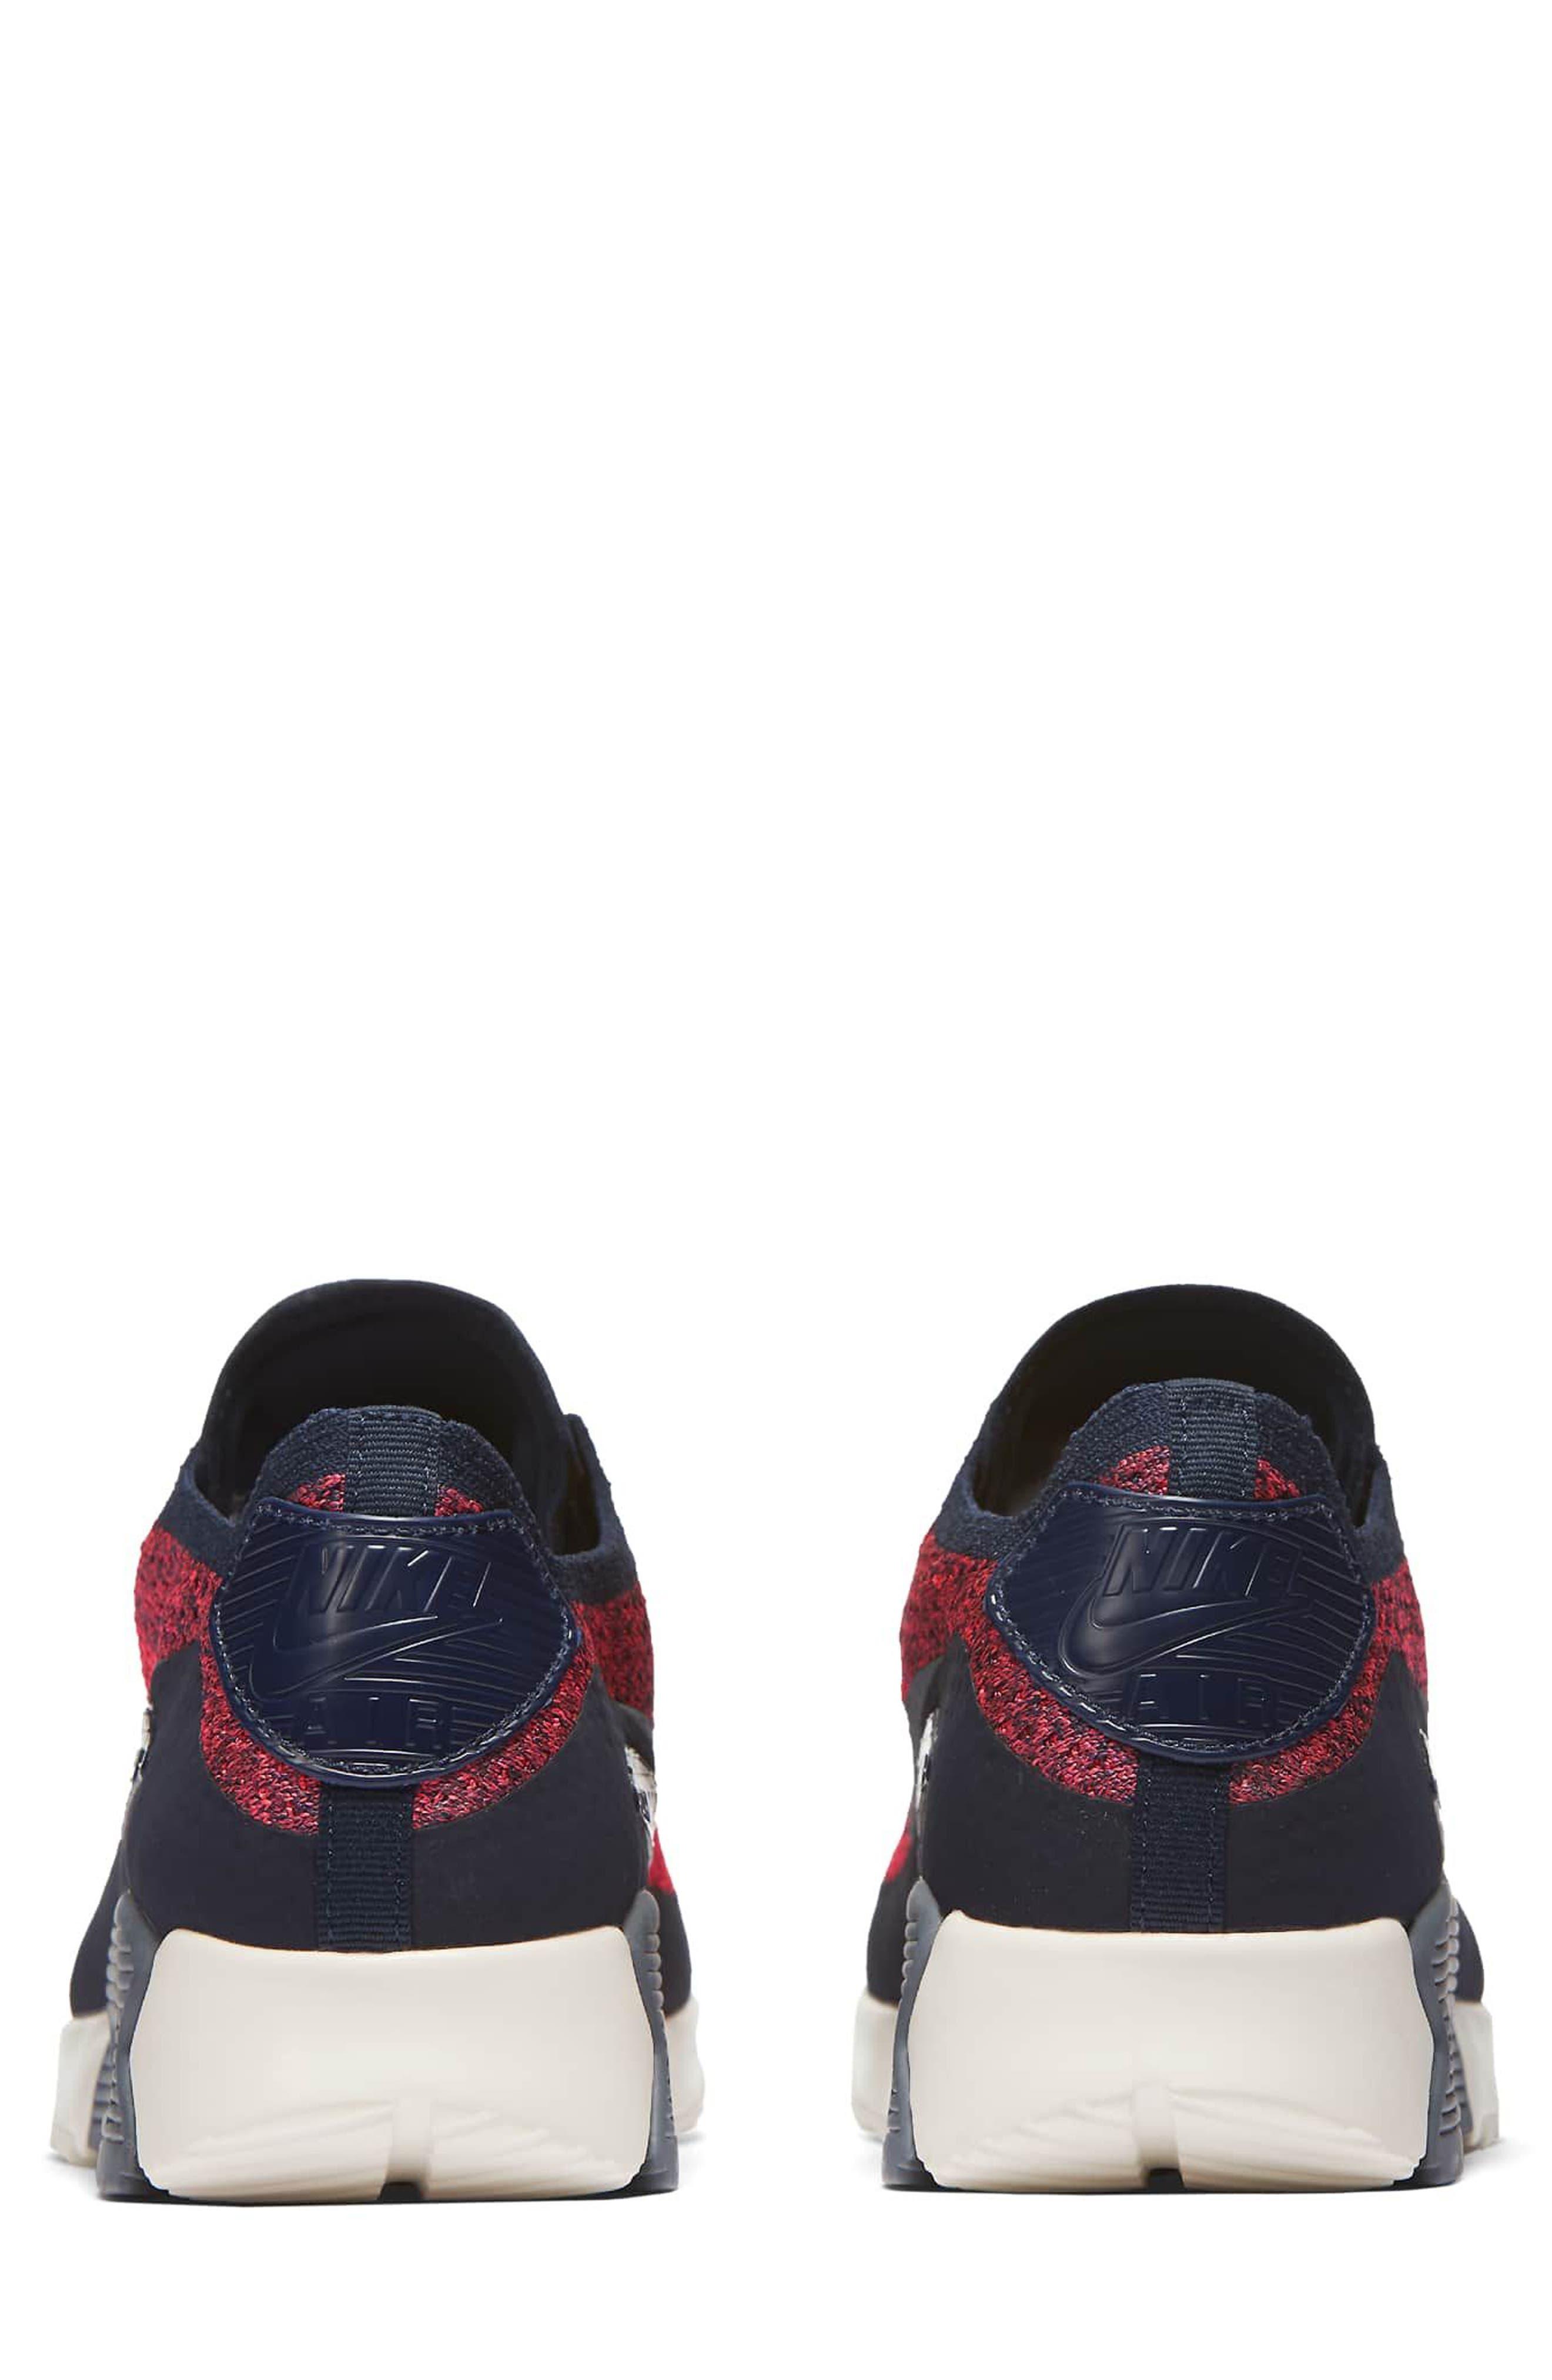 Air Max 90 Flyknit Ultra 2.0 Sneaker,                             Alternate thumbnail 6, color,